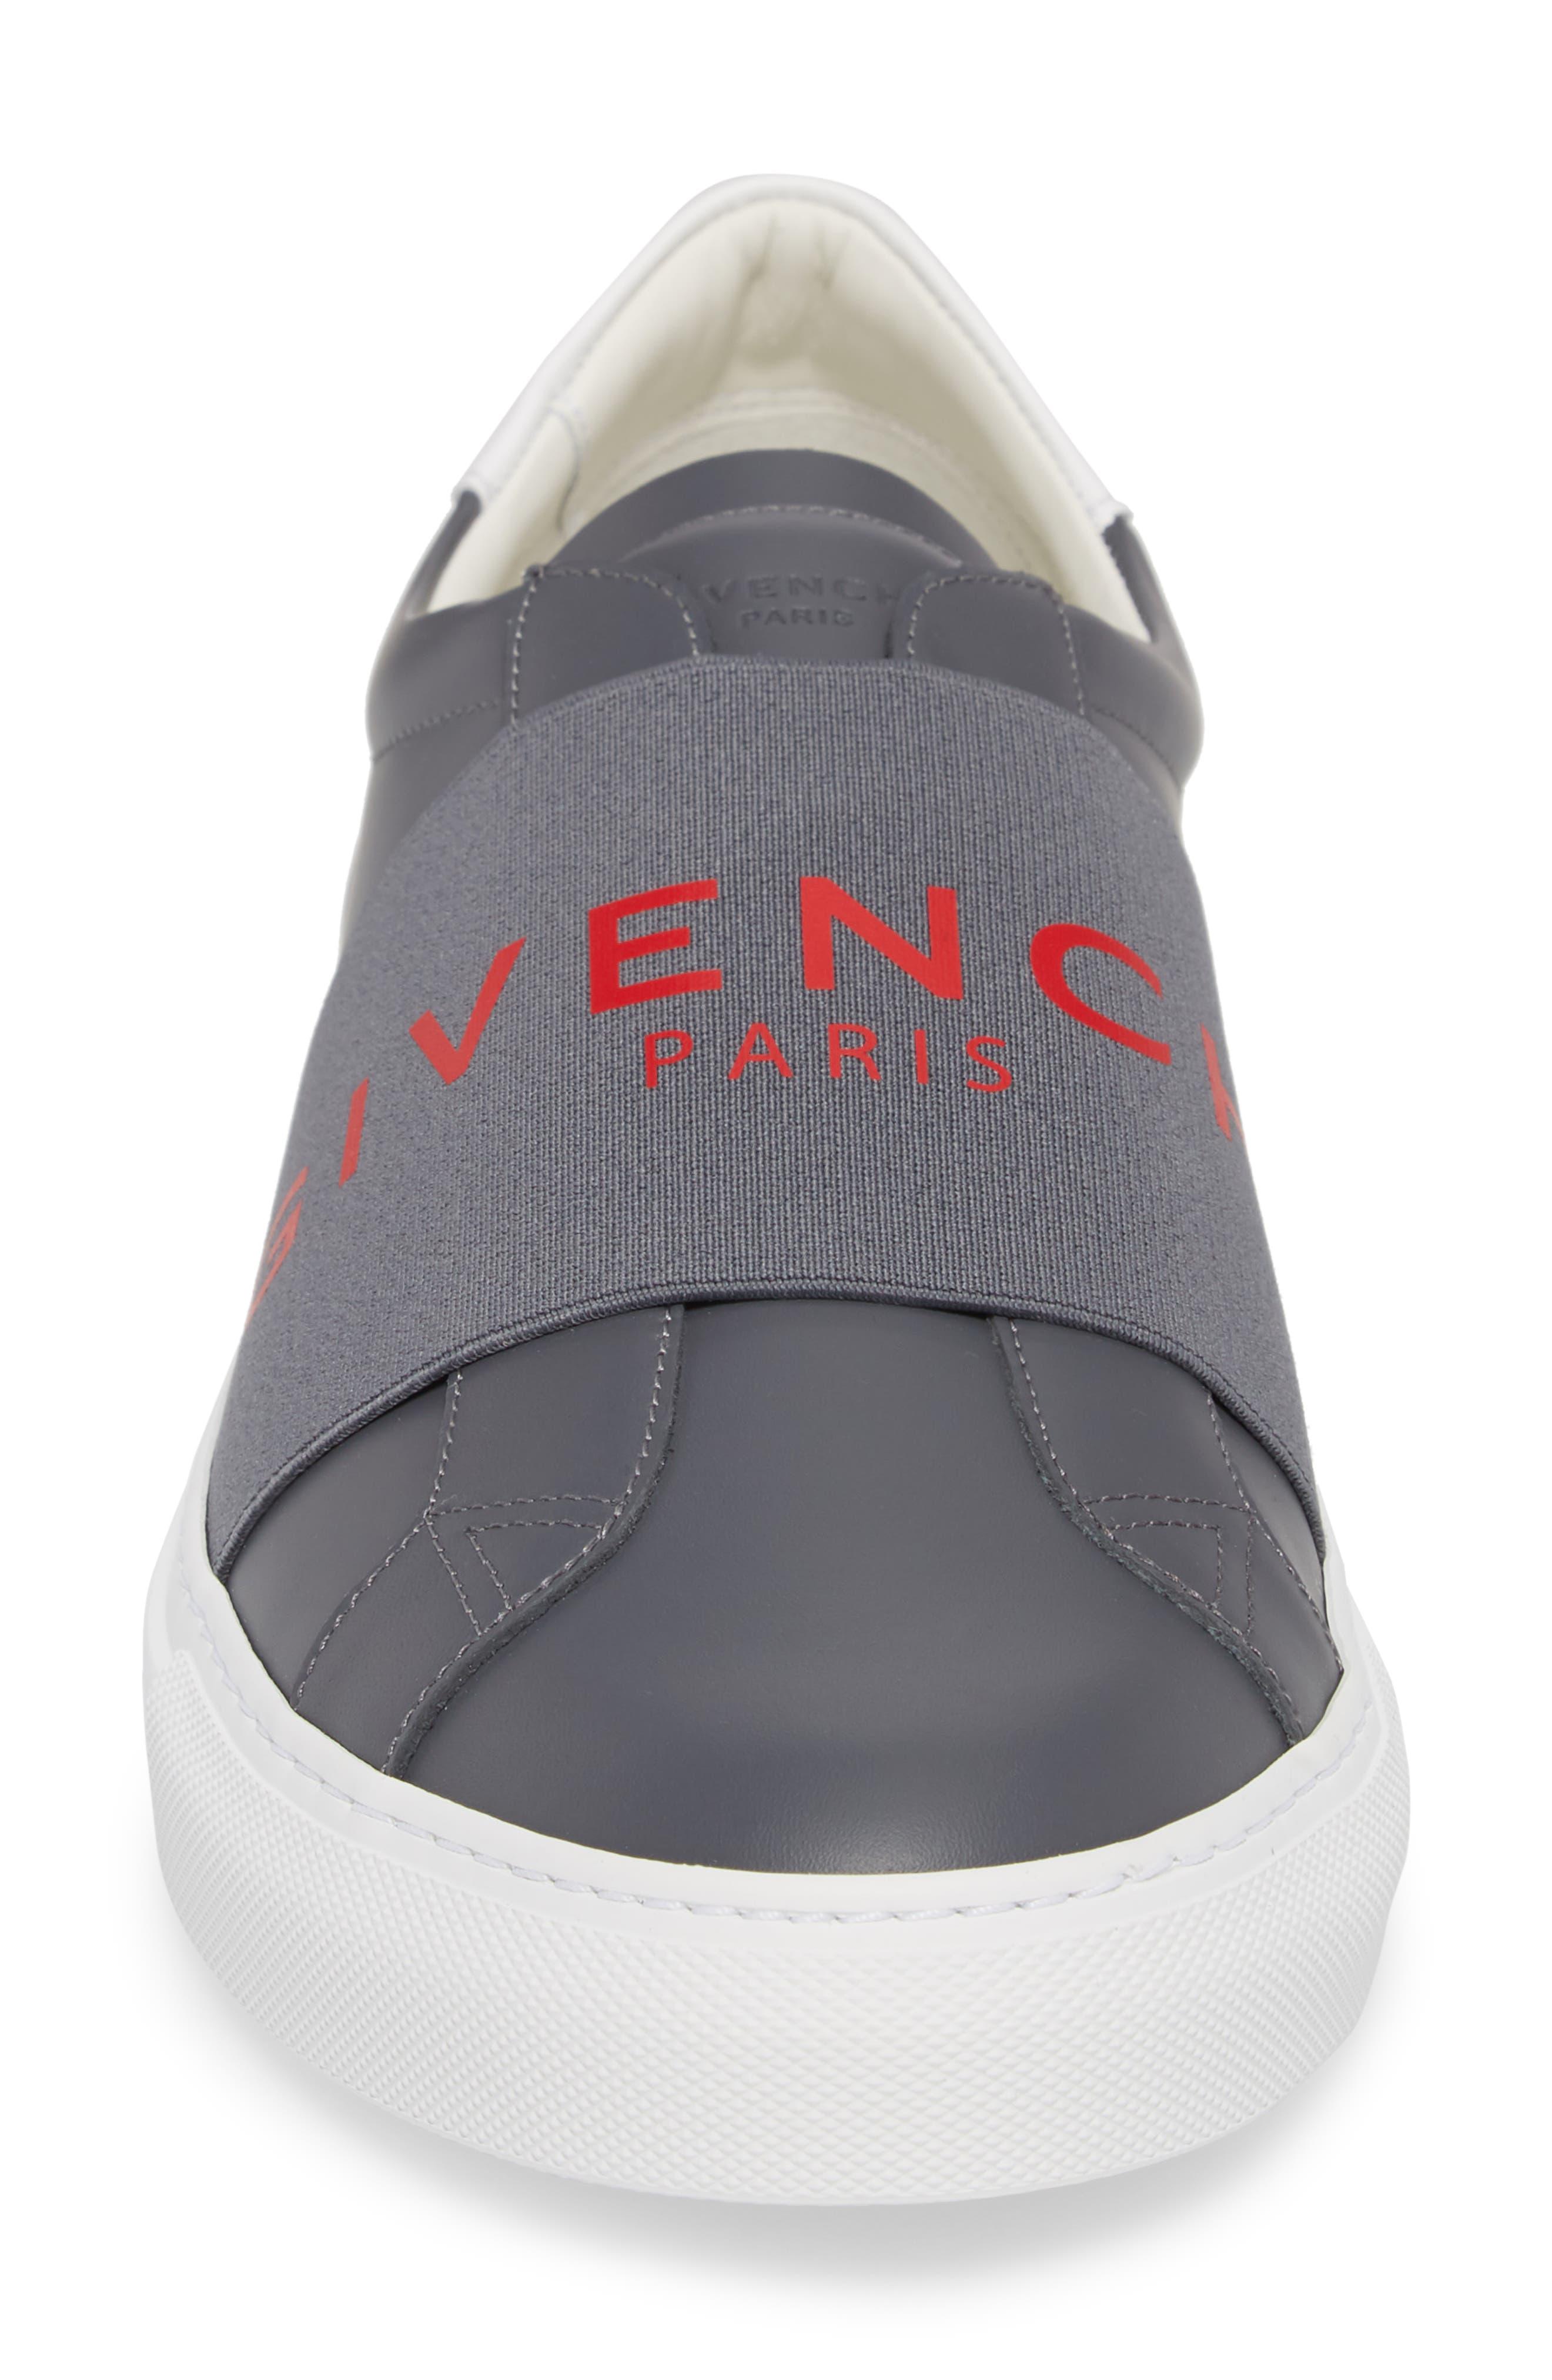 Urban Knots Sneaker,                             Alternate thumbnail 4, color,                             GREY